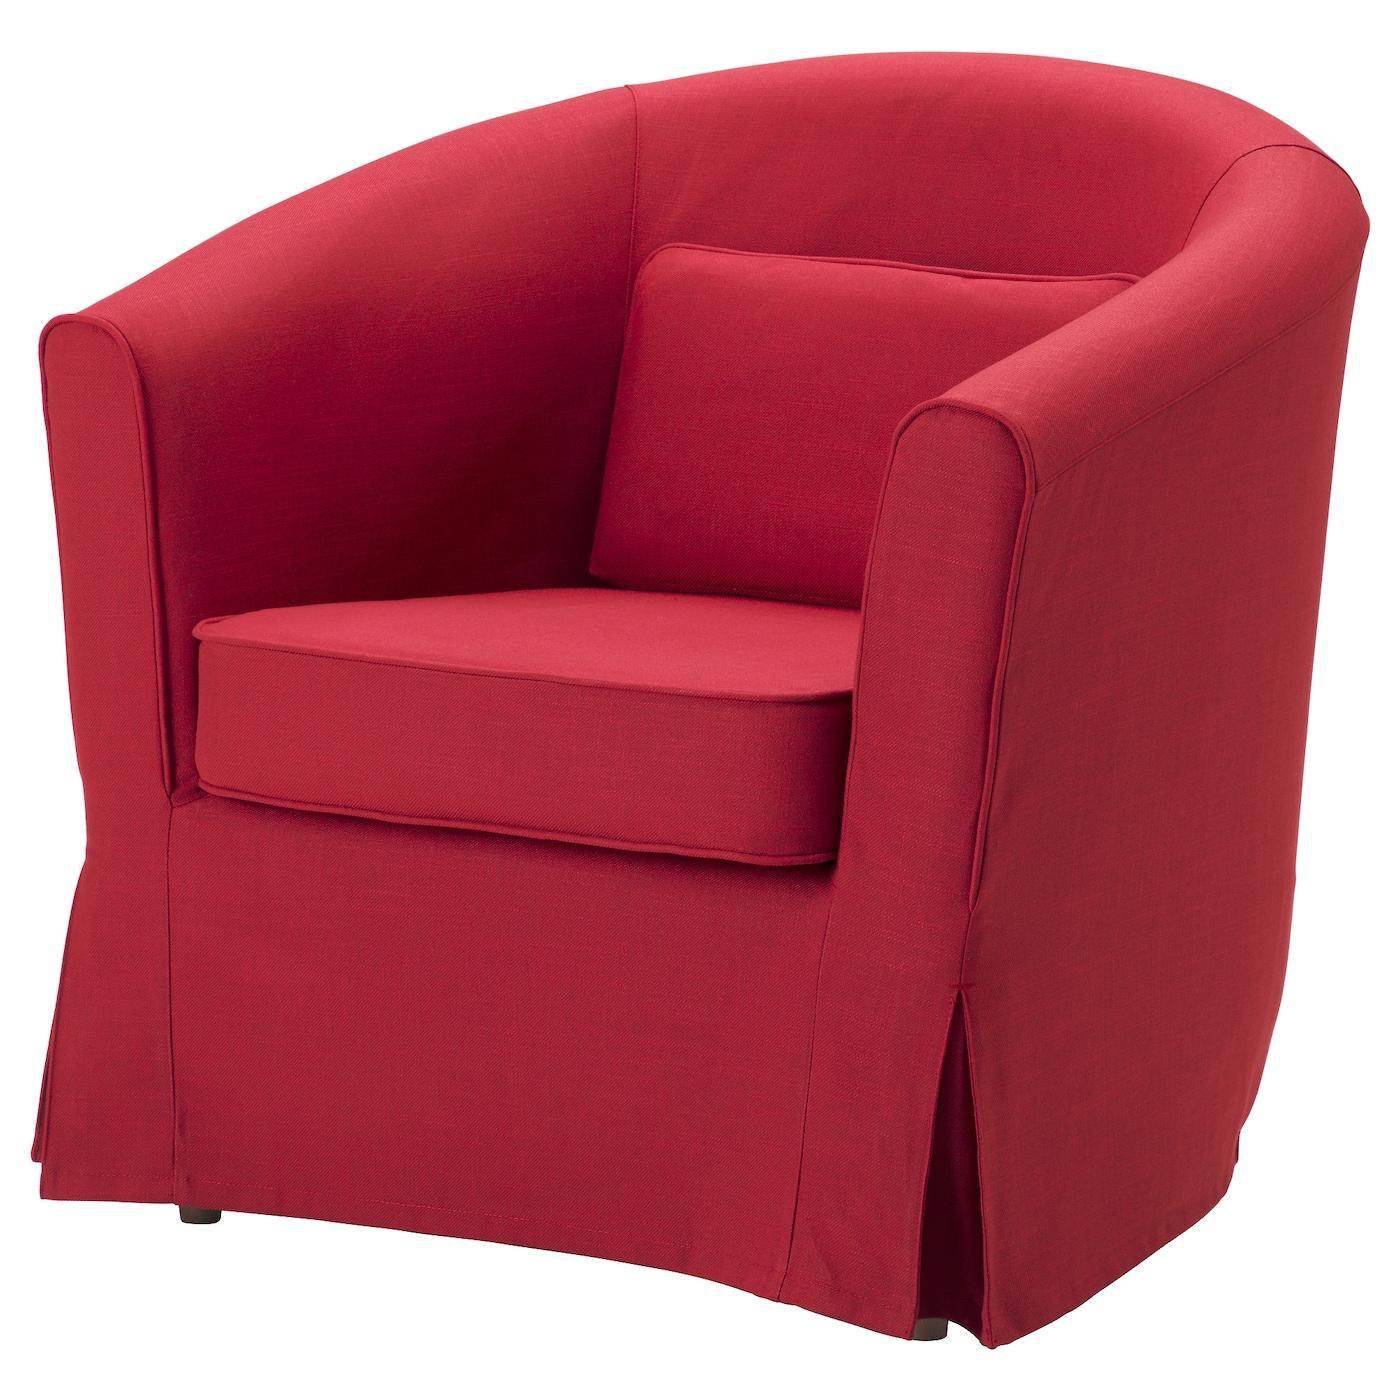 tullsta armchair nordvalla red ikea. Black Bedroom Furniture Sets. Home Design Ideas